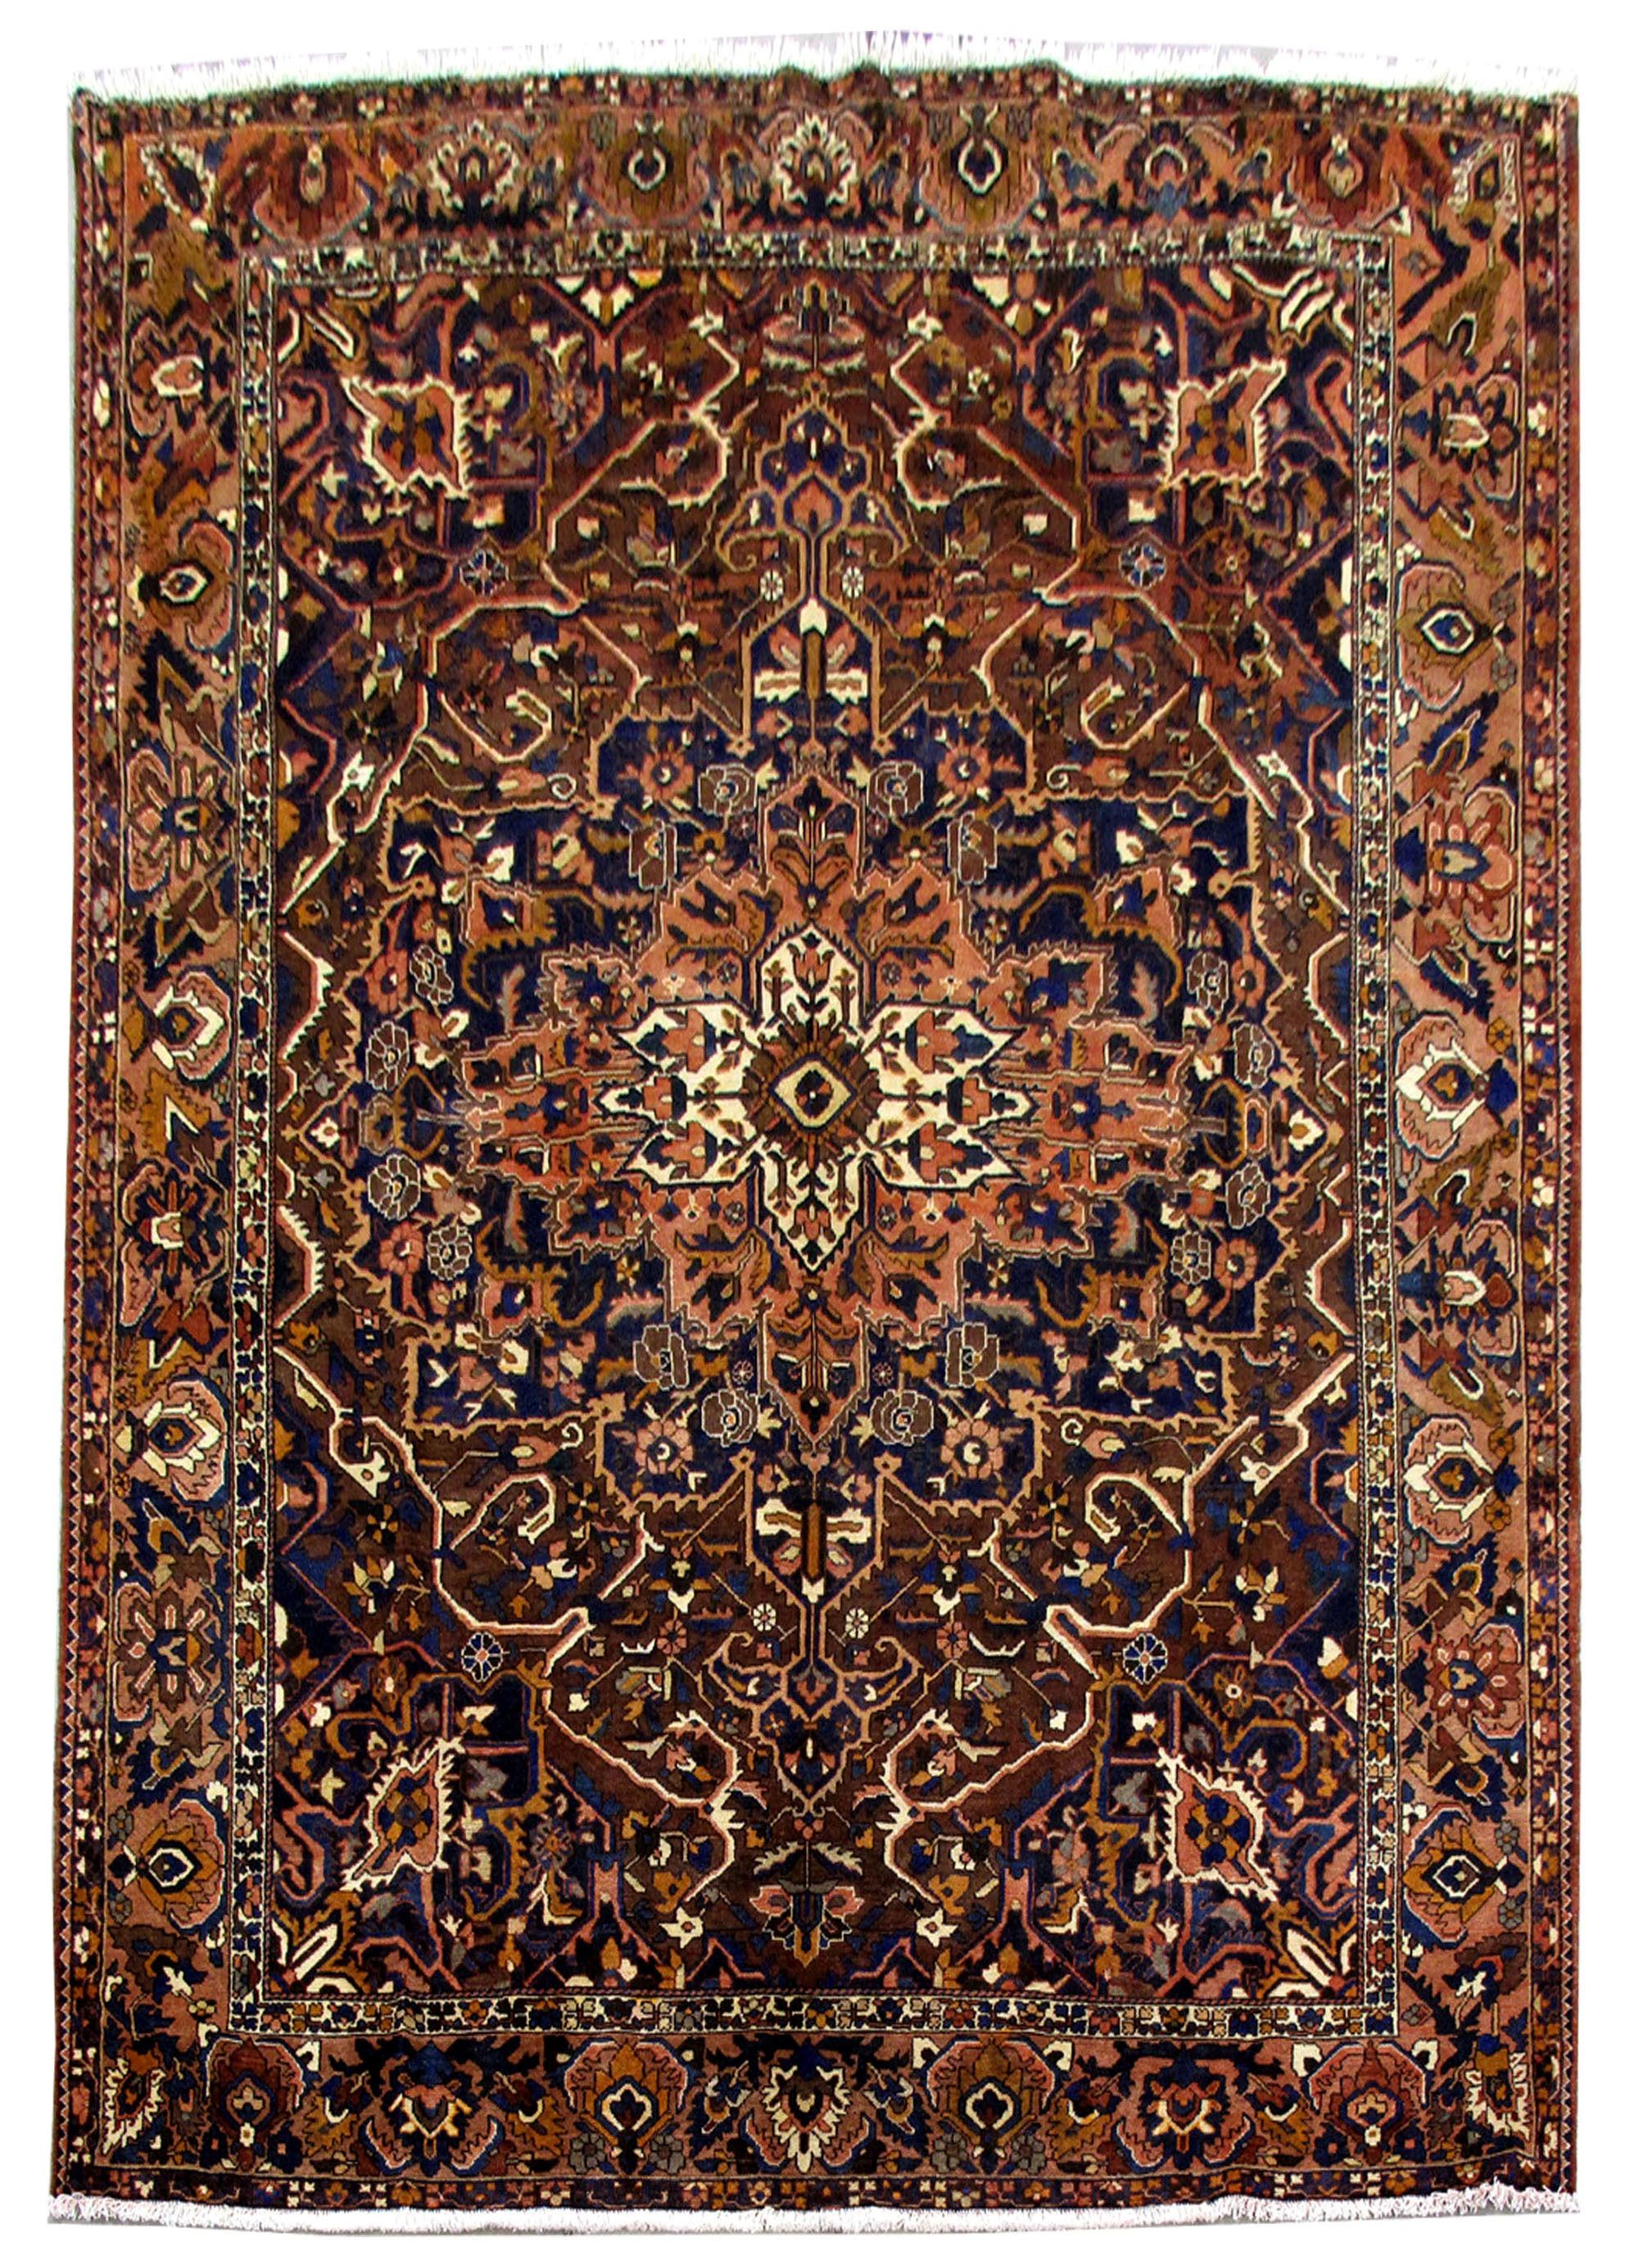 10x12 bakhtiari oriental made by hand persian wool rug ebay. Black Bedroom Furniture Sets. Home Design Ideas